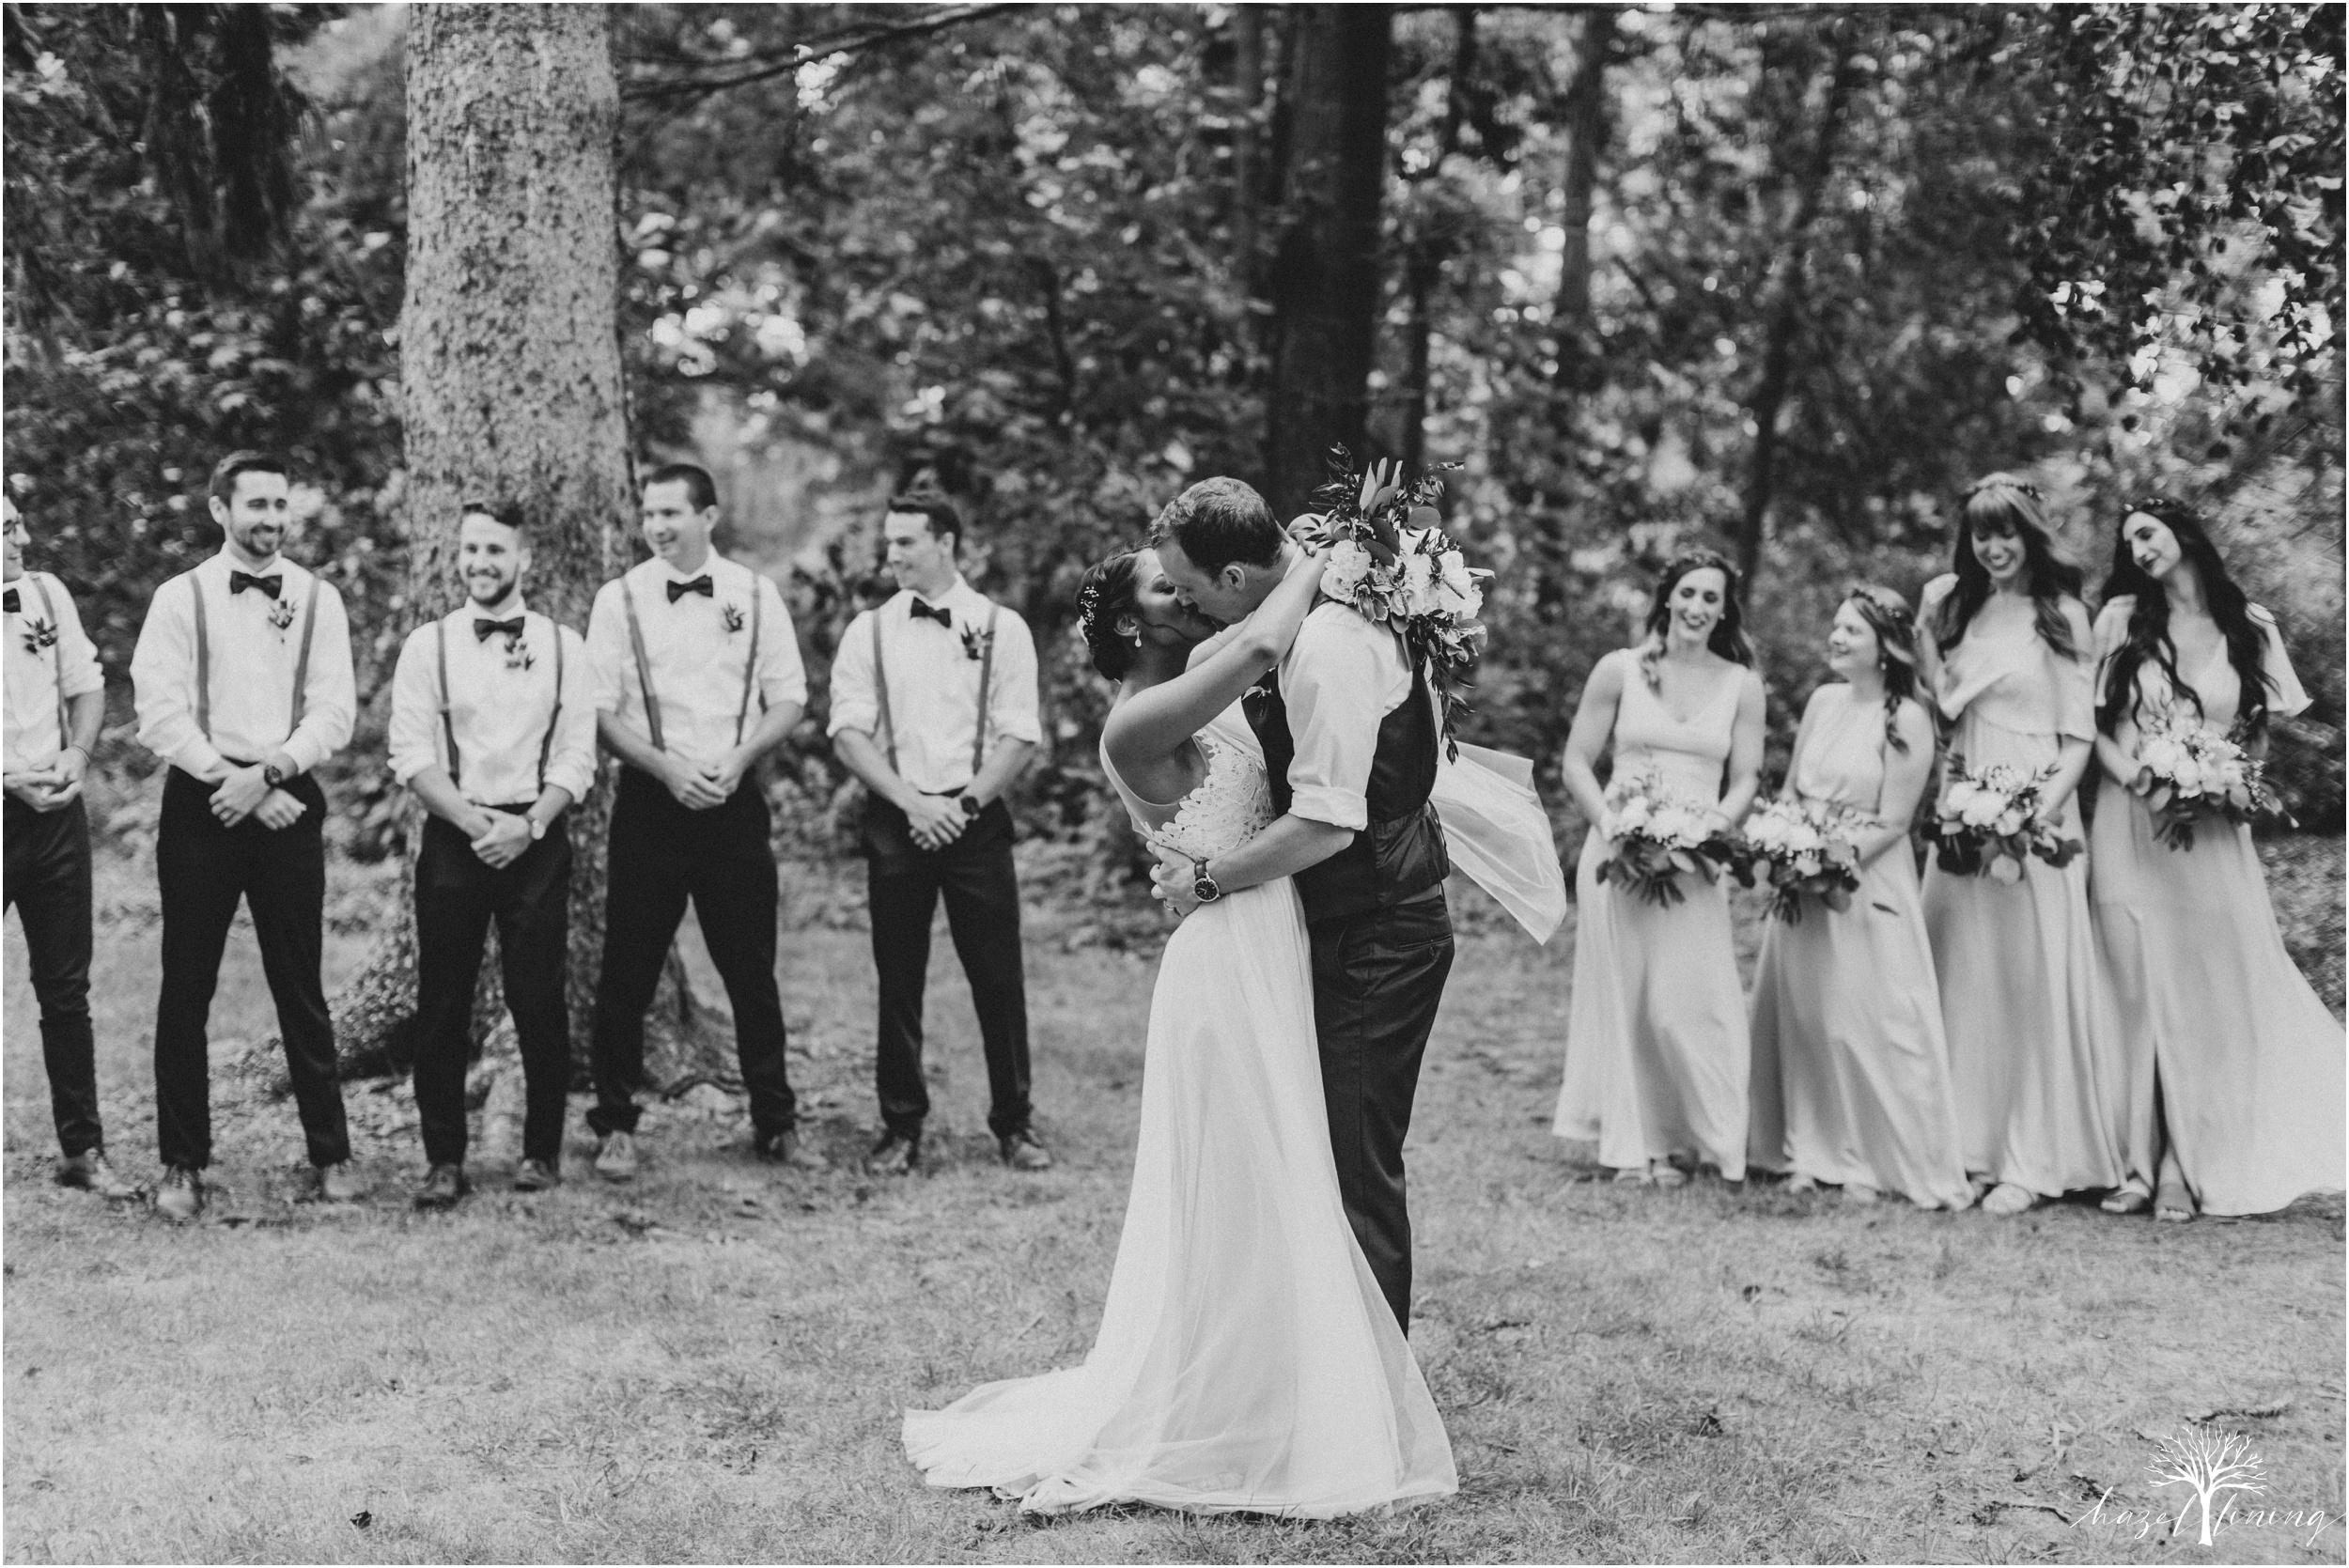 mariah-kreyling-samuel-sherratt-sherrattwiththeworld-peirce-farm-at-witch-hill-boston-massachusetts-wedding-photography-hazel-lining-travel-wedding-elopement-photography_0107.jpg